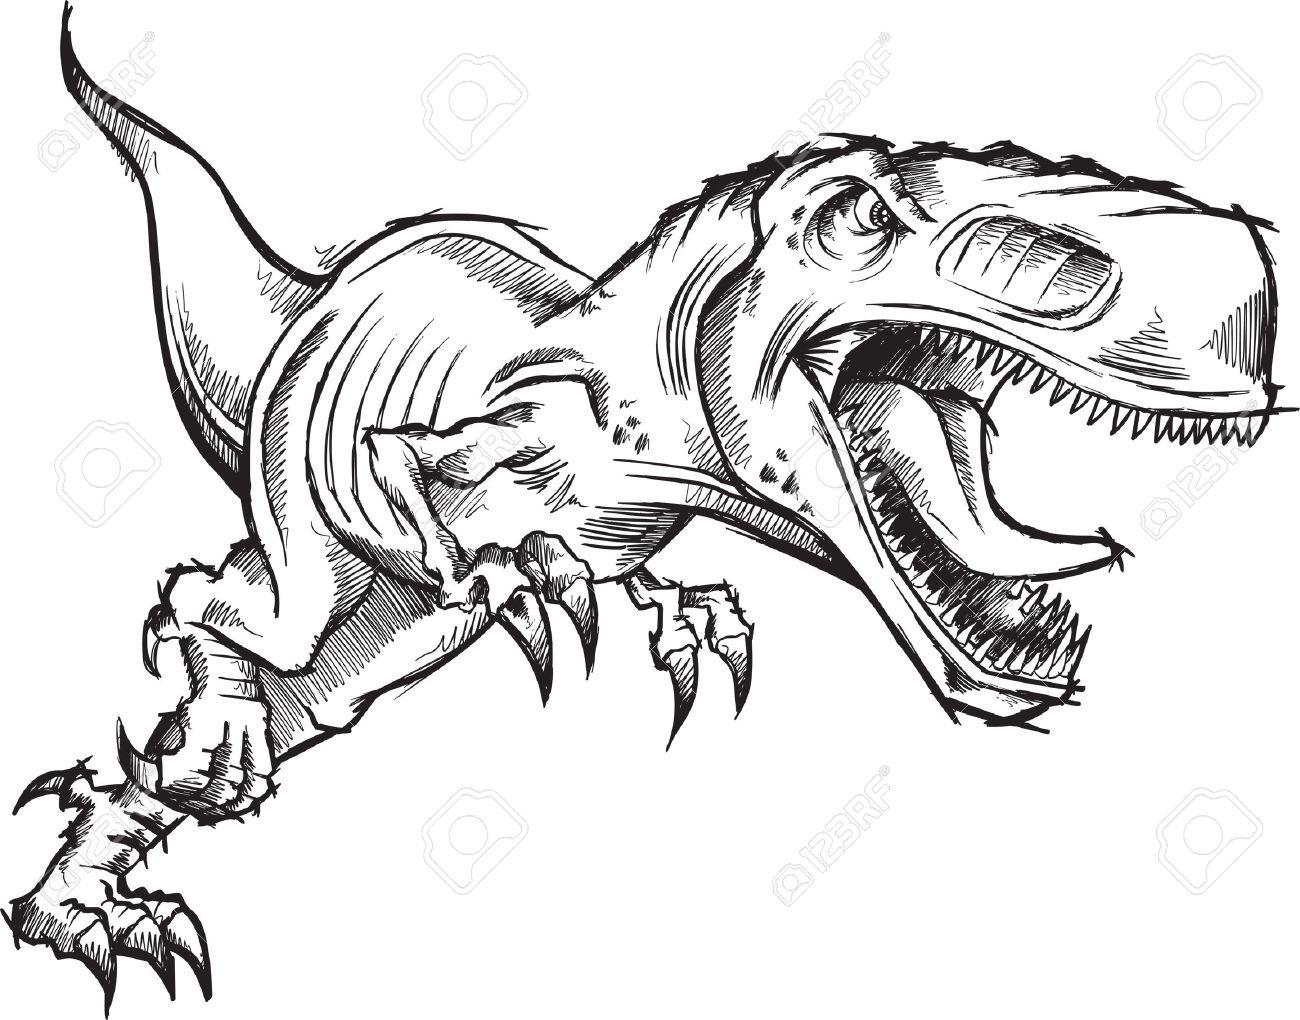 Tyrannosaurus Dinosaur Sketch Doodle - 6774863